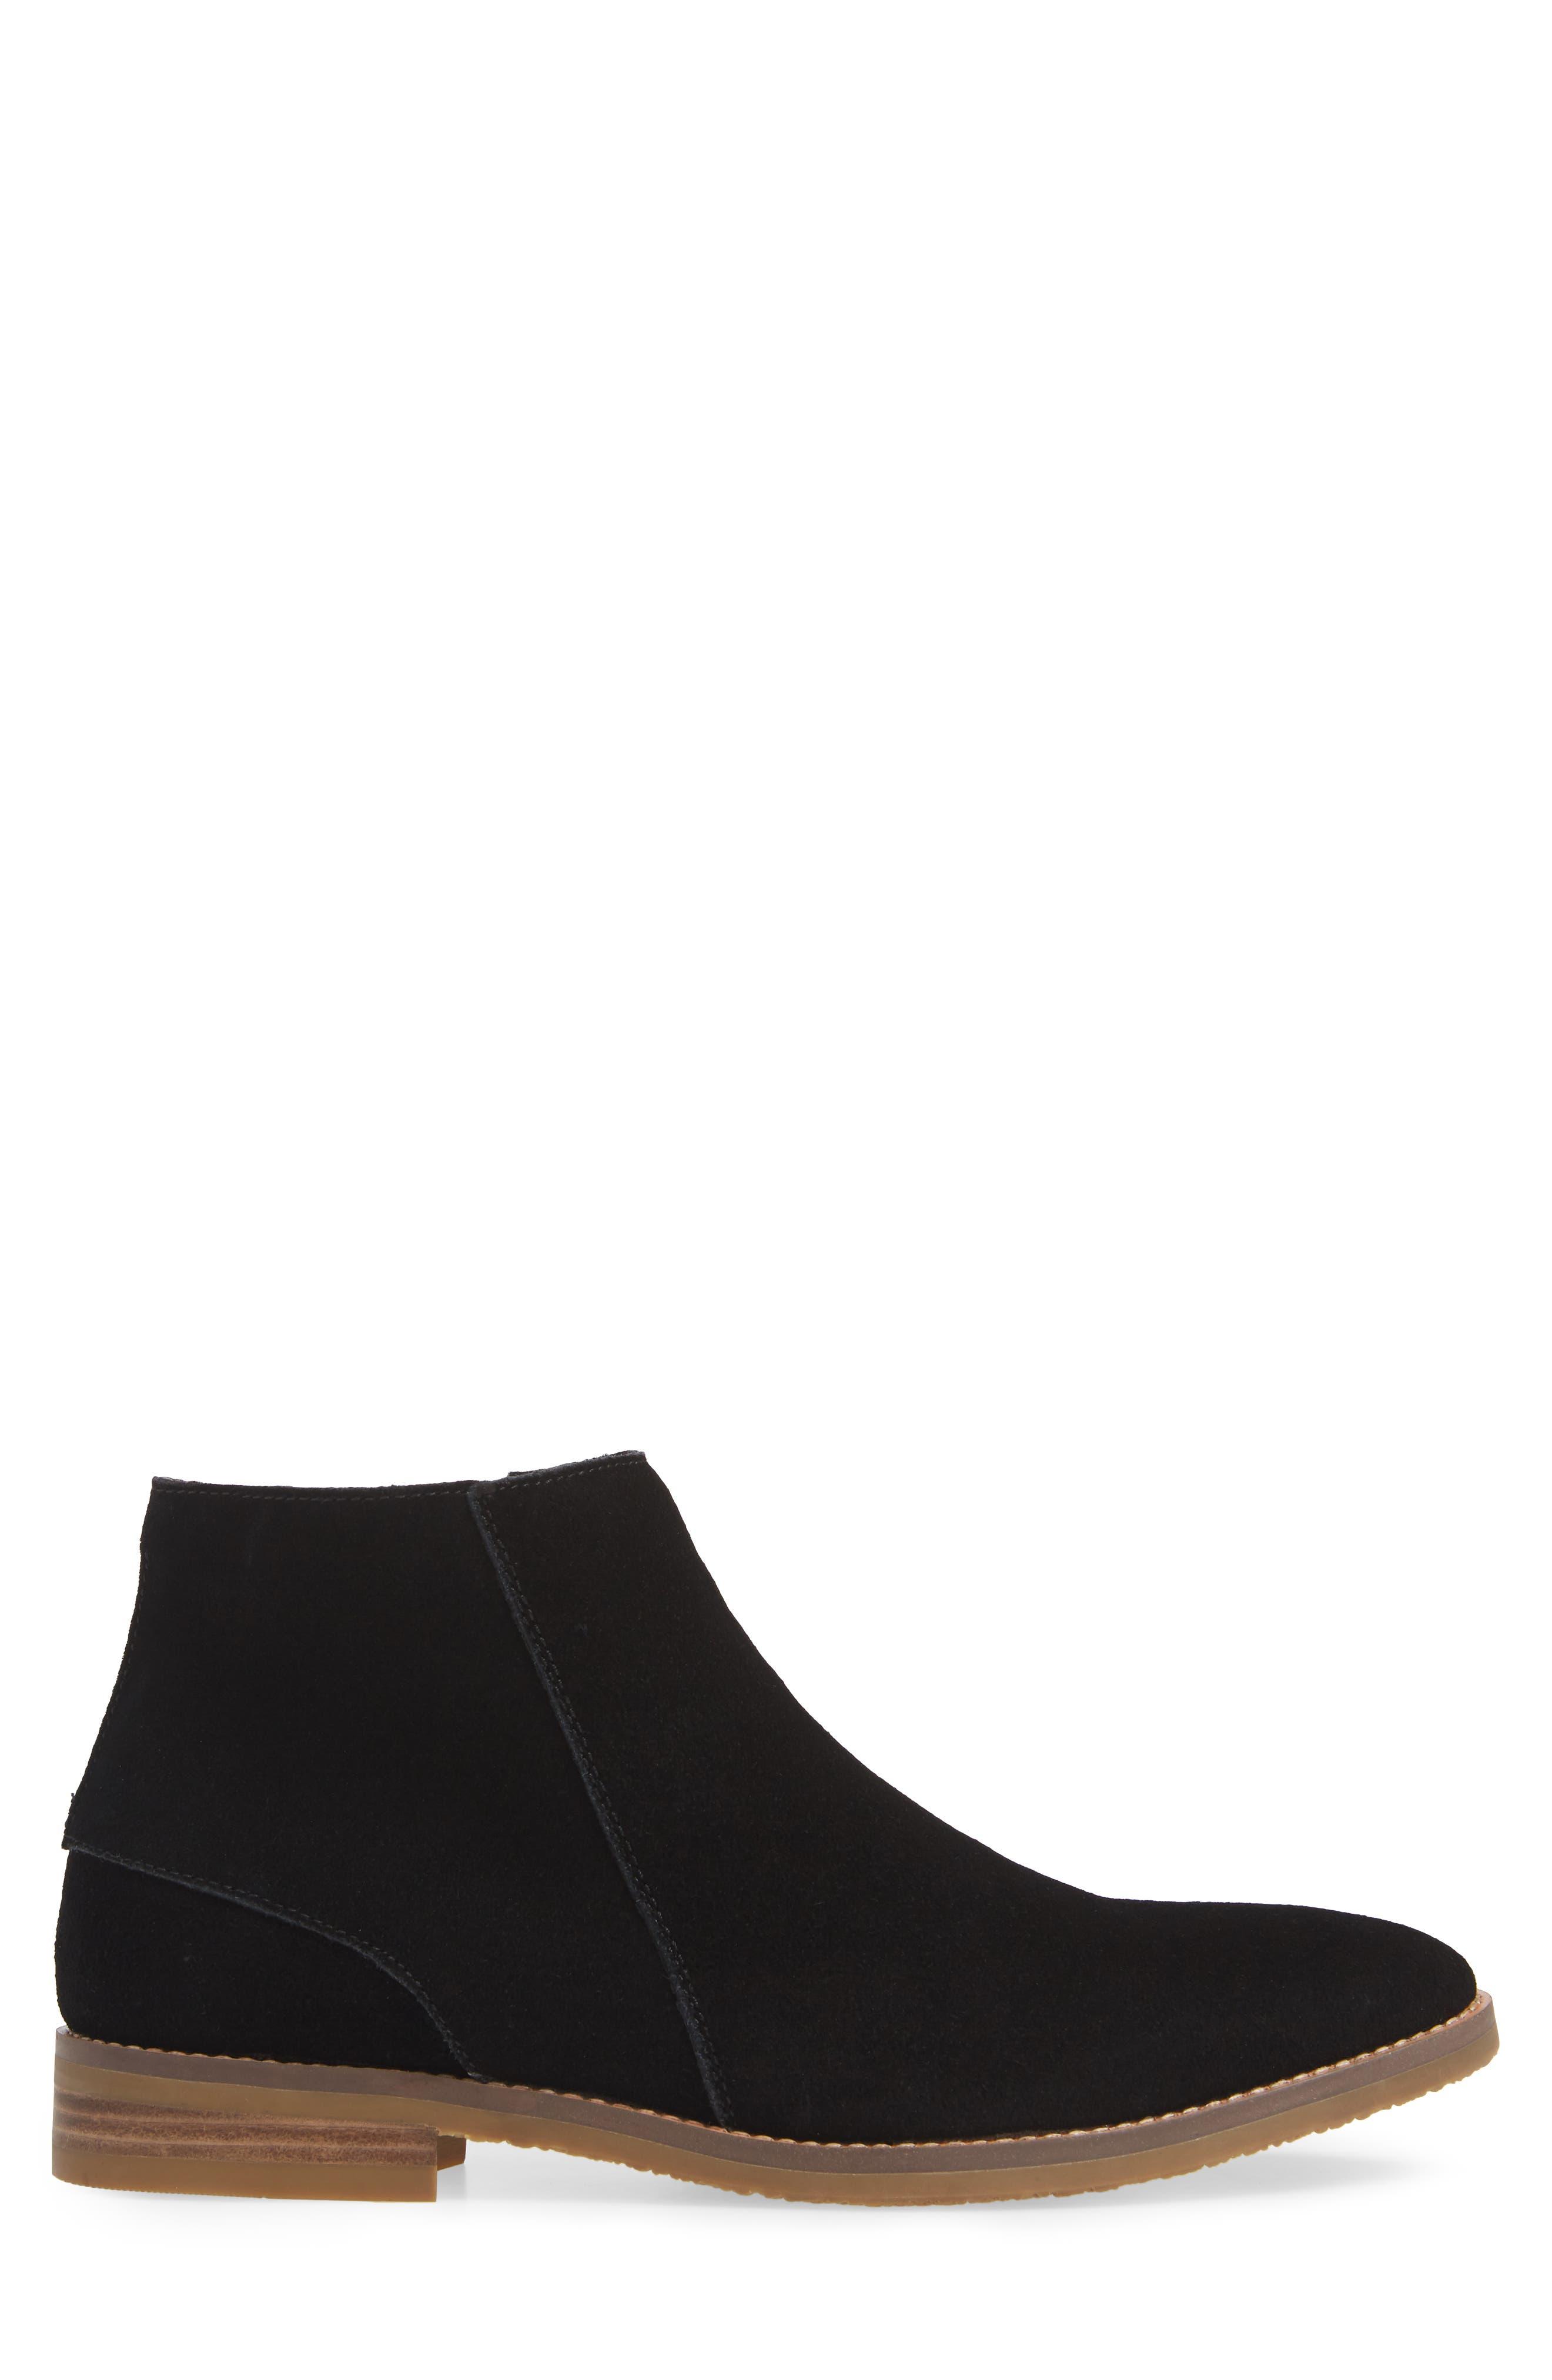 JUMP, Brighton Chelsea Zip Boot, Alternate thumbnail 3, color, BLACK